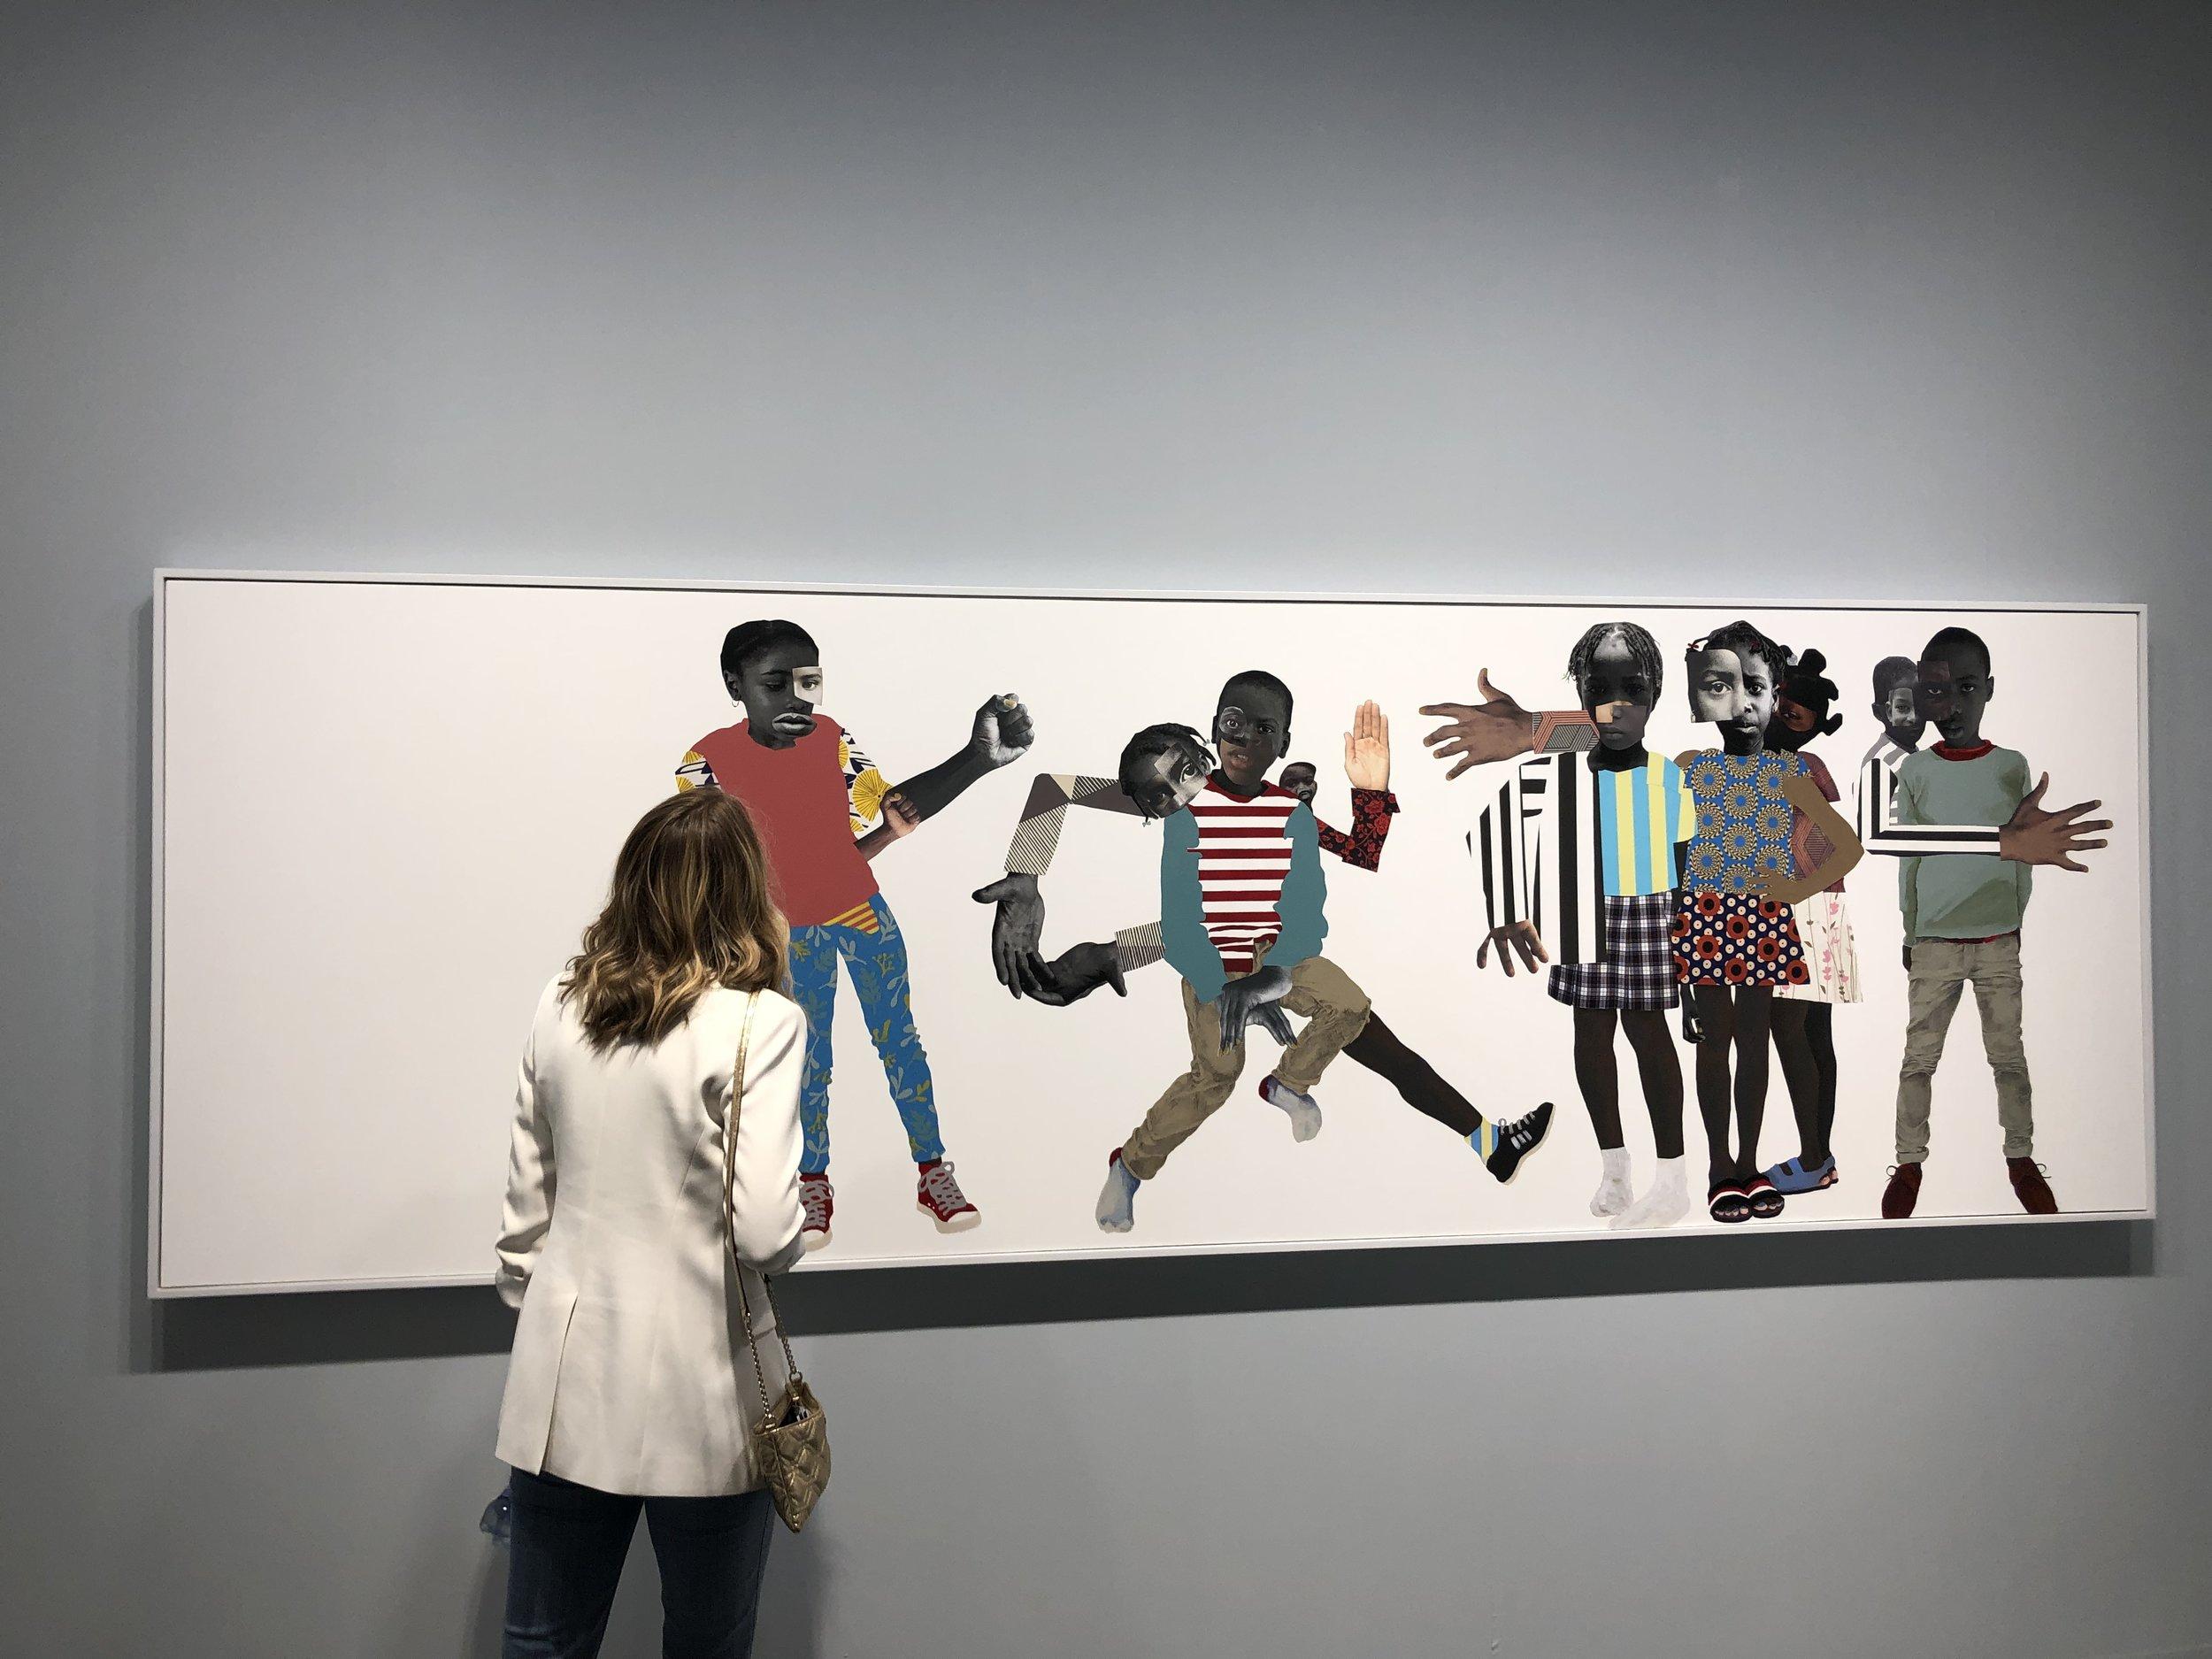 - CBFA at Art Basel Miami 2018